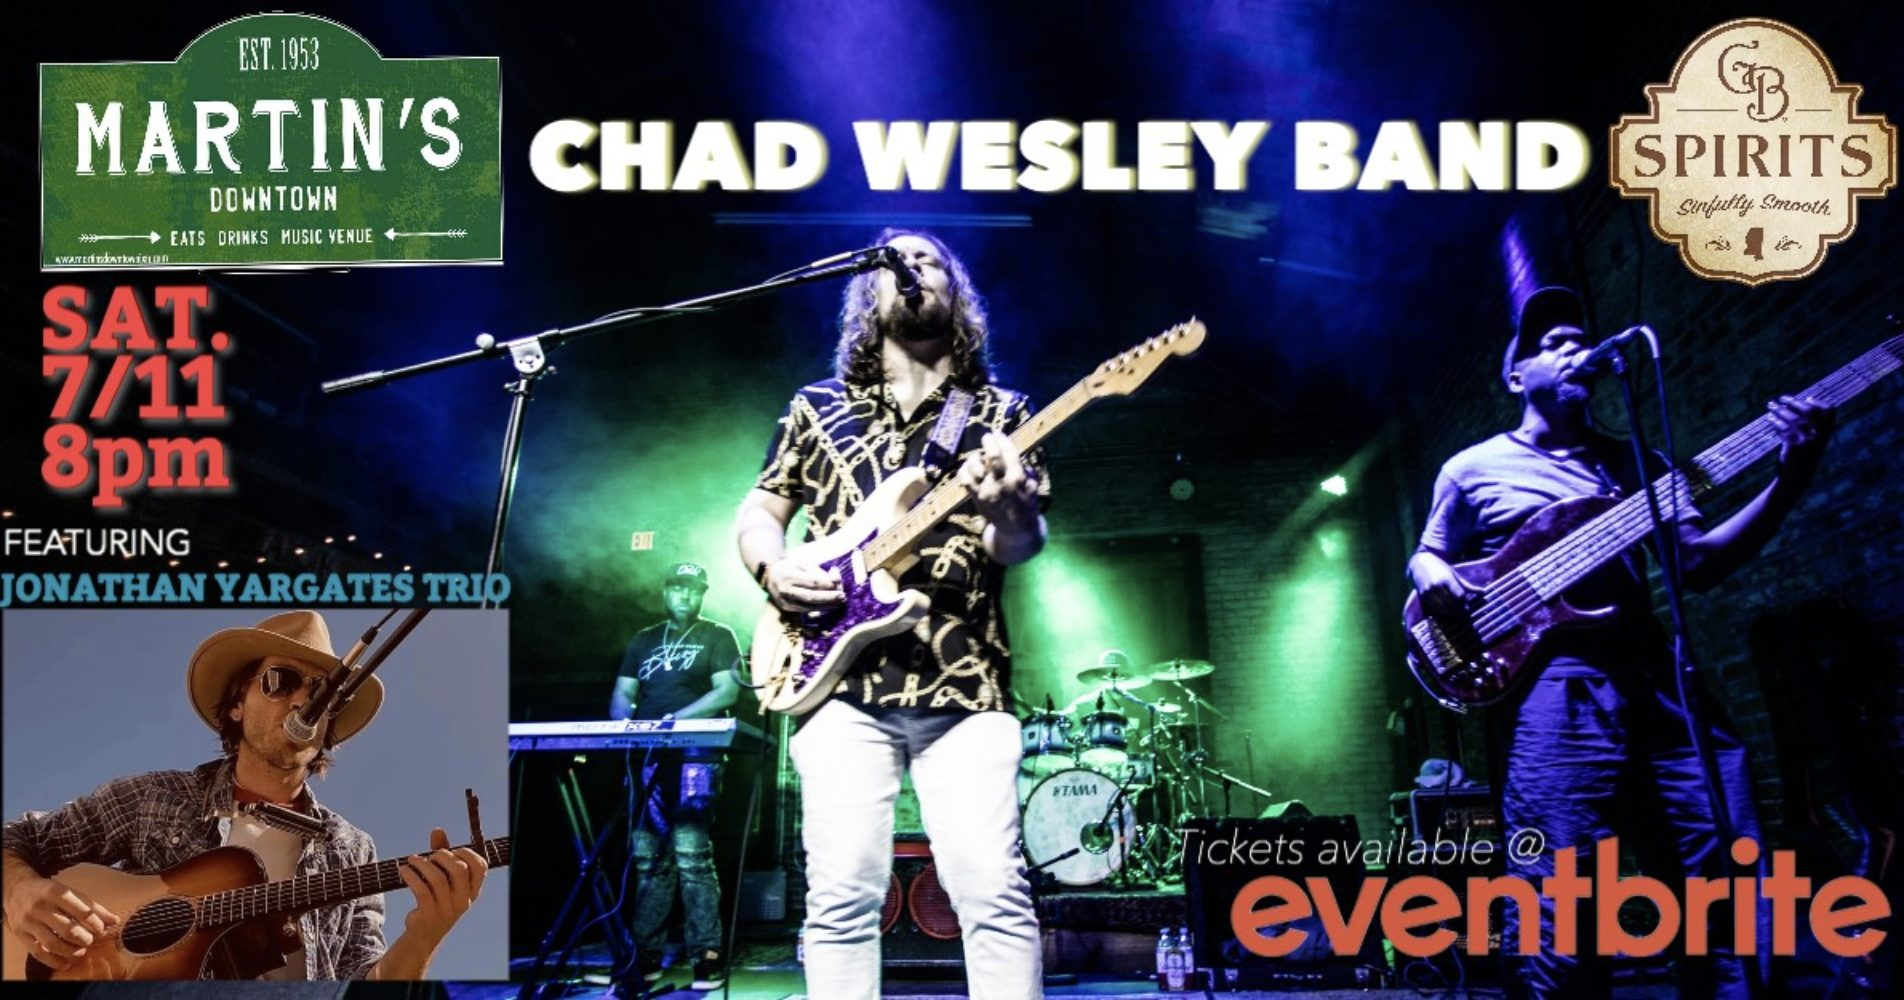 LIVE MUSIC: Chad Wesley Band w/ Jonathan Yargates Trio